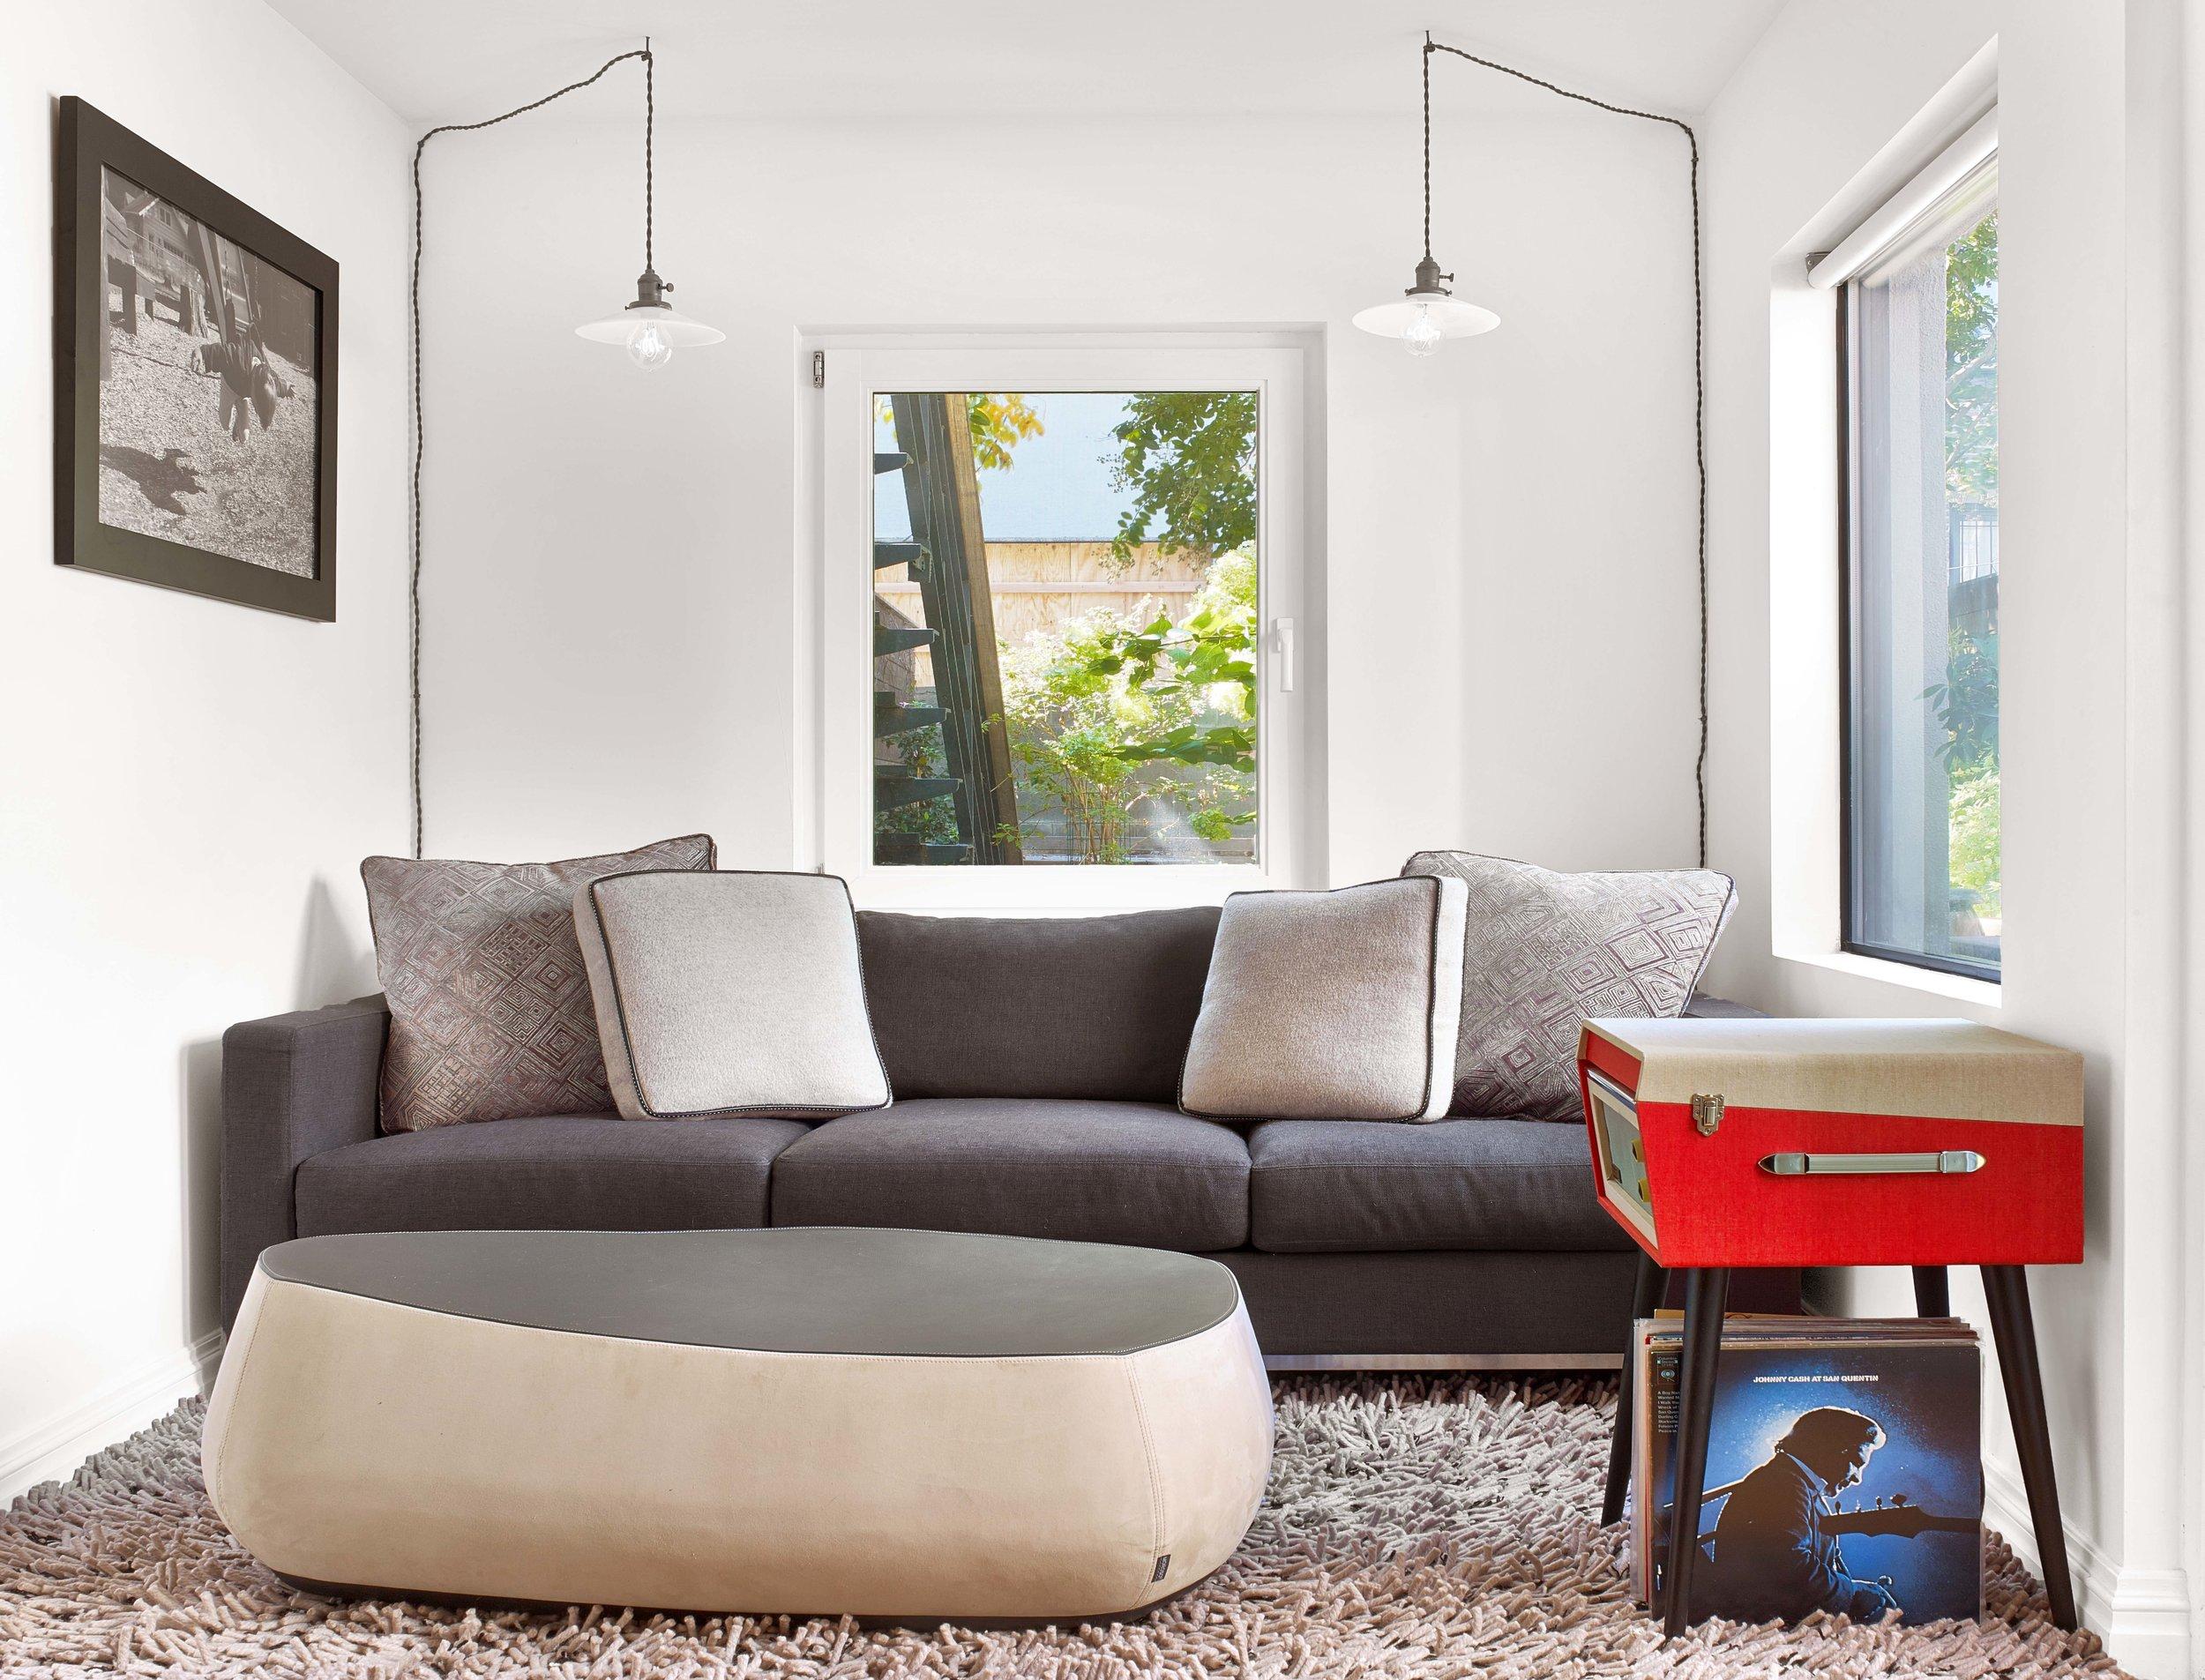 Leather-Ottoman-Moroso-USA-JMorris-Design-Brooklyn.jpg